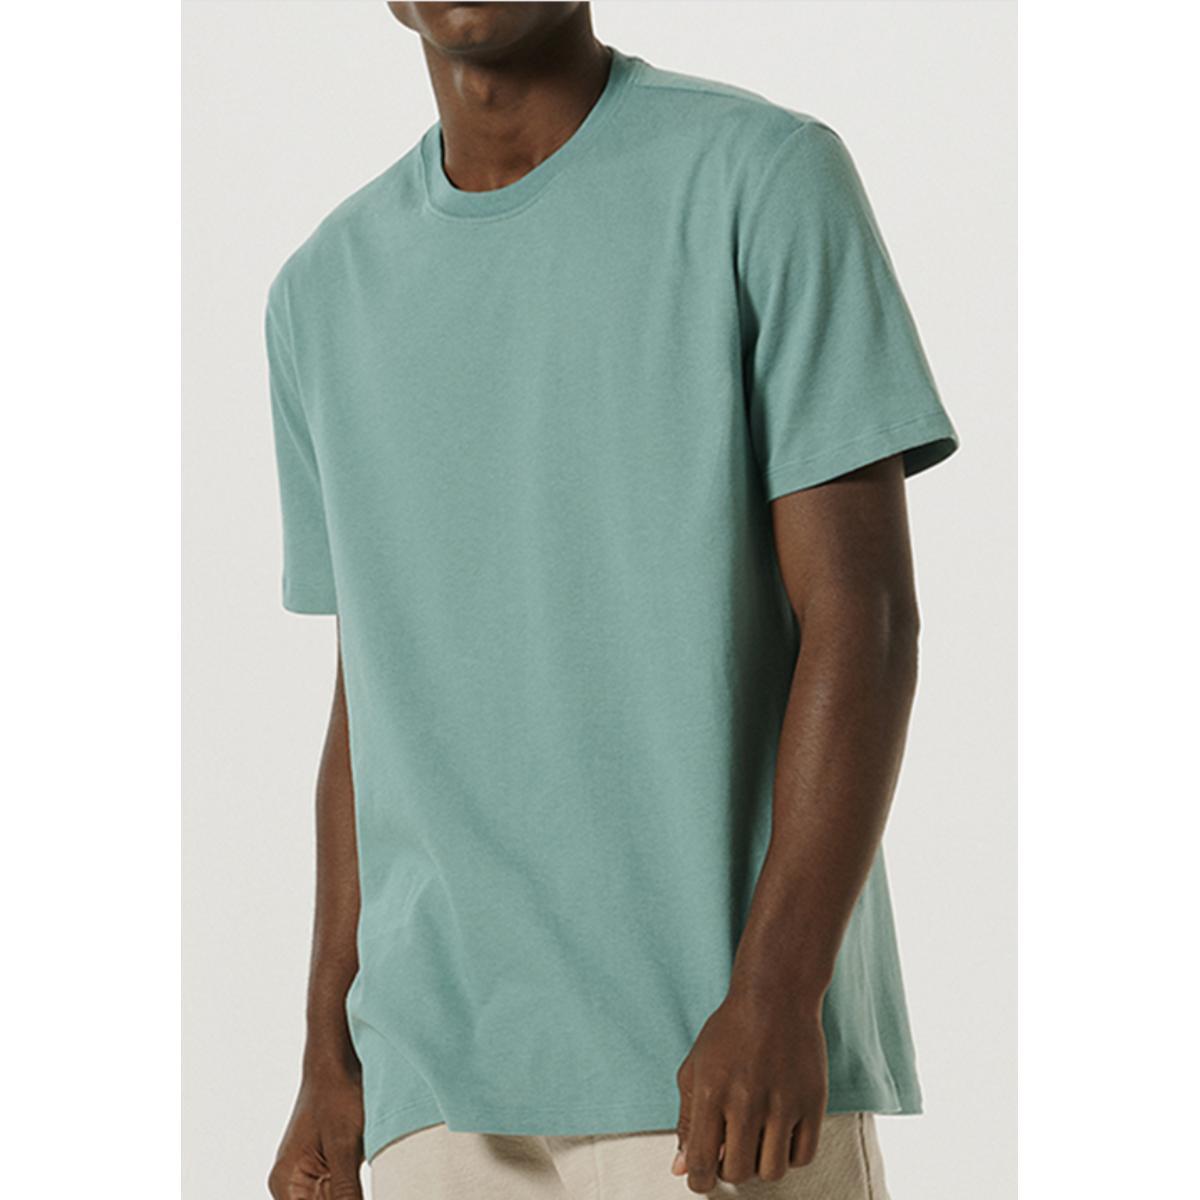 Camiseta Masculina Hering 0227 Wg9en Verde